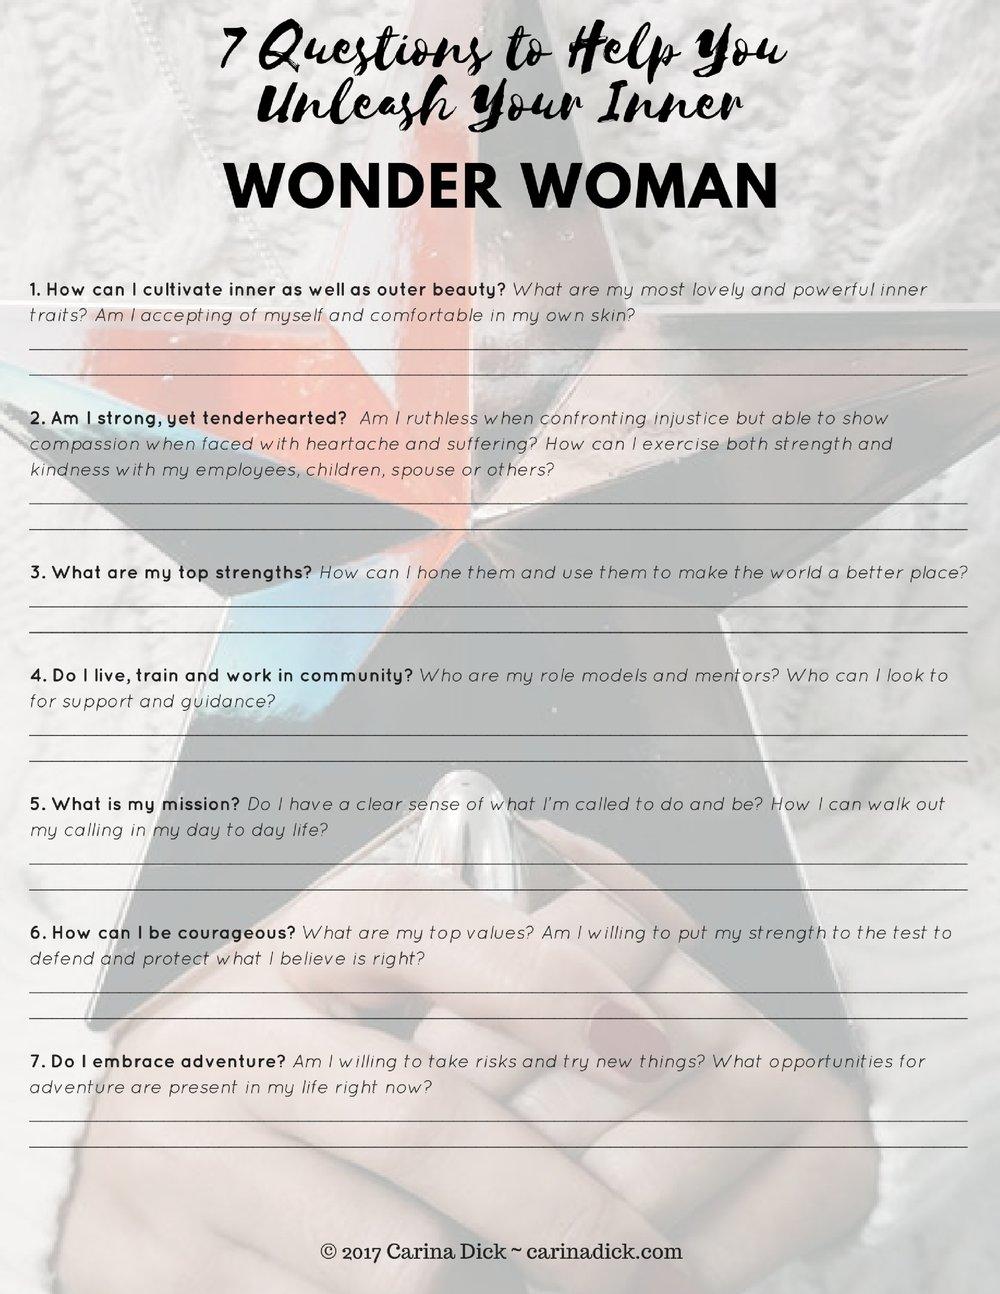 Wonder Woman 7 Questions.jpg